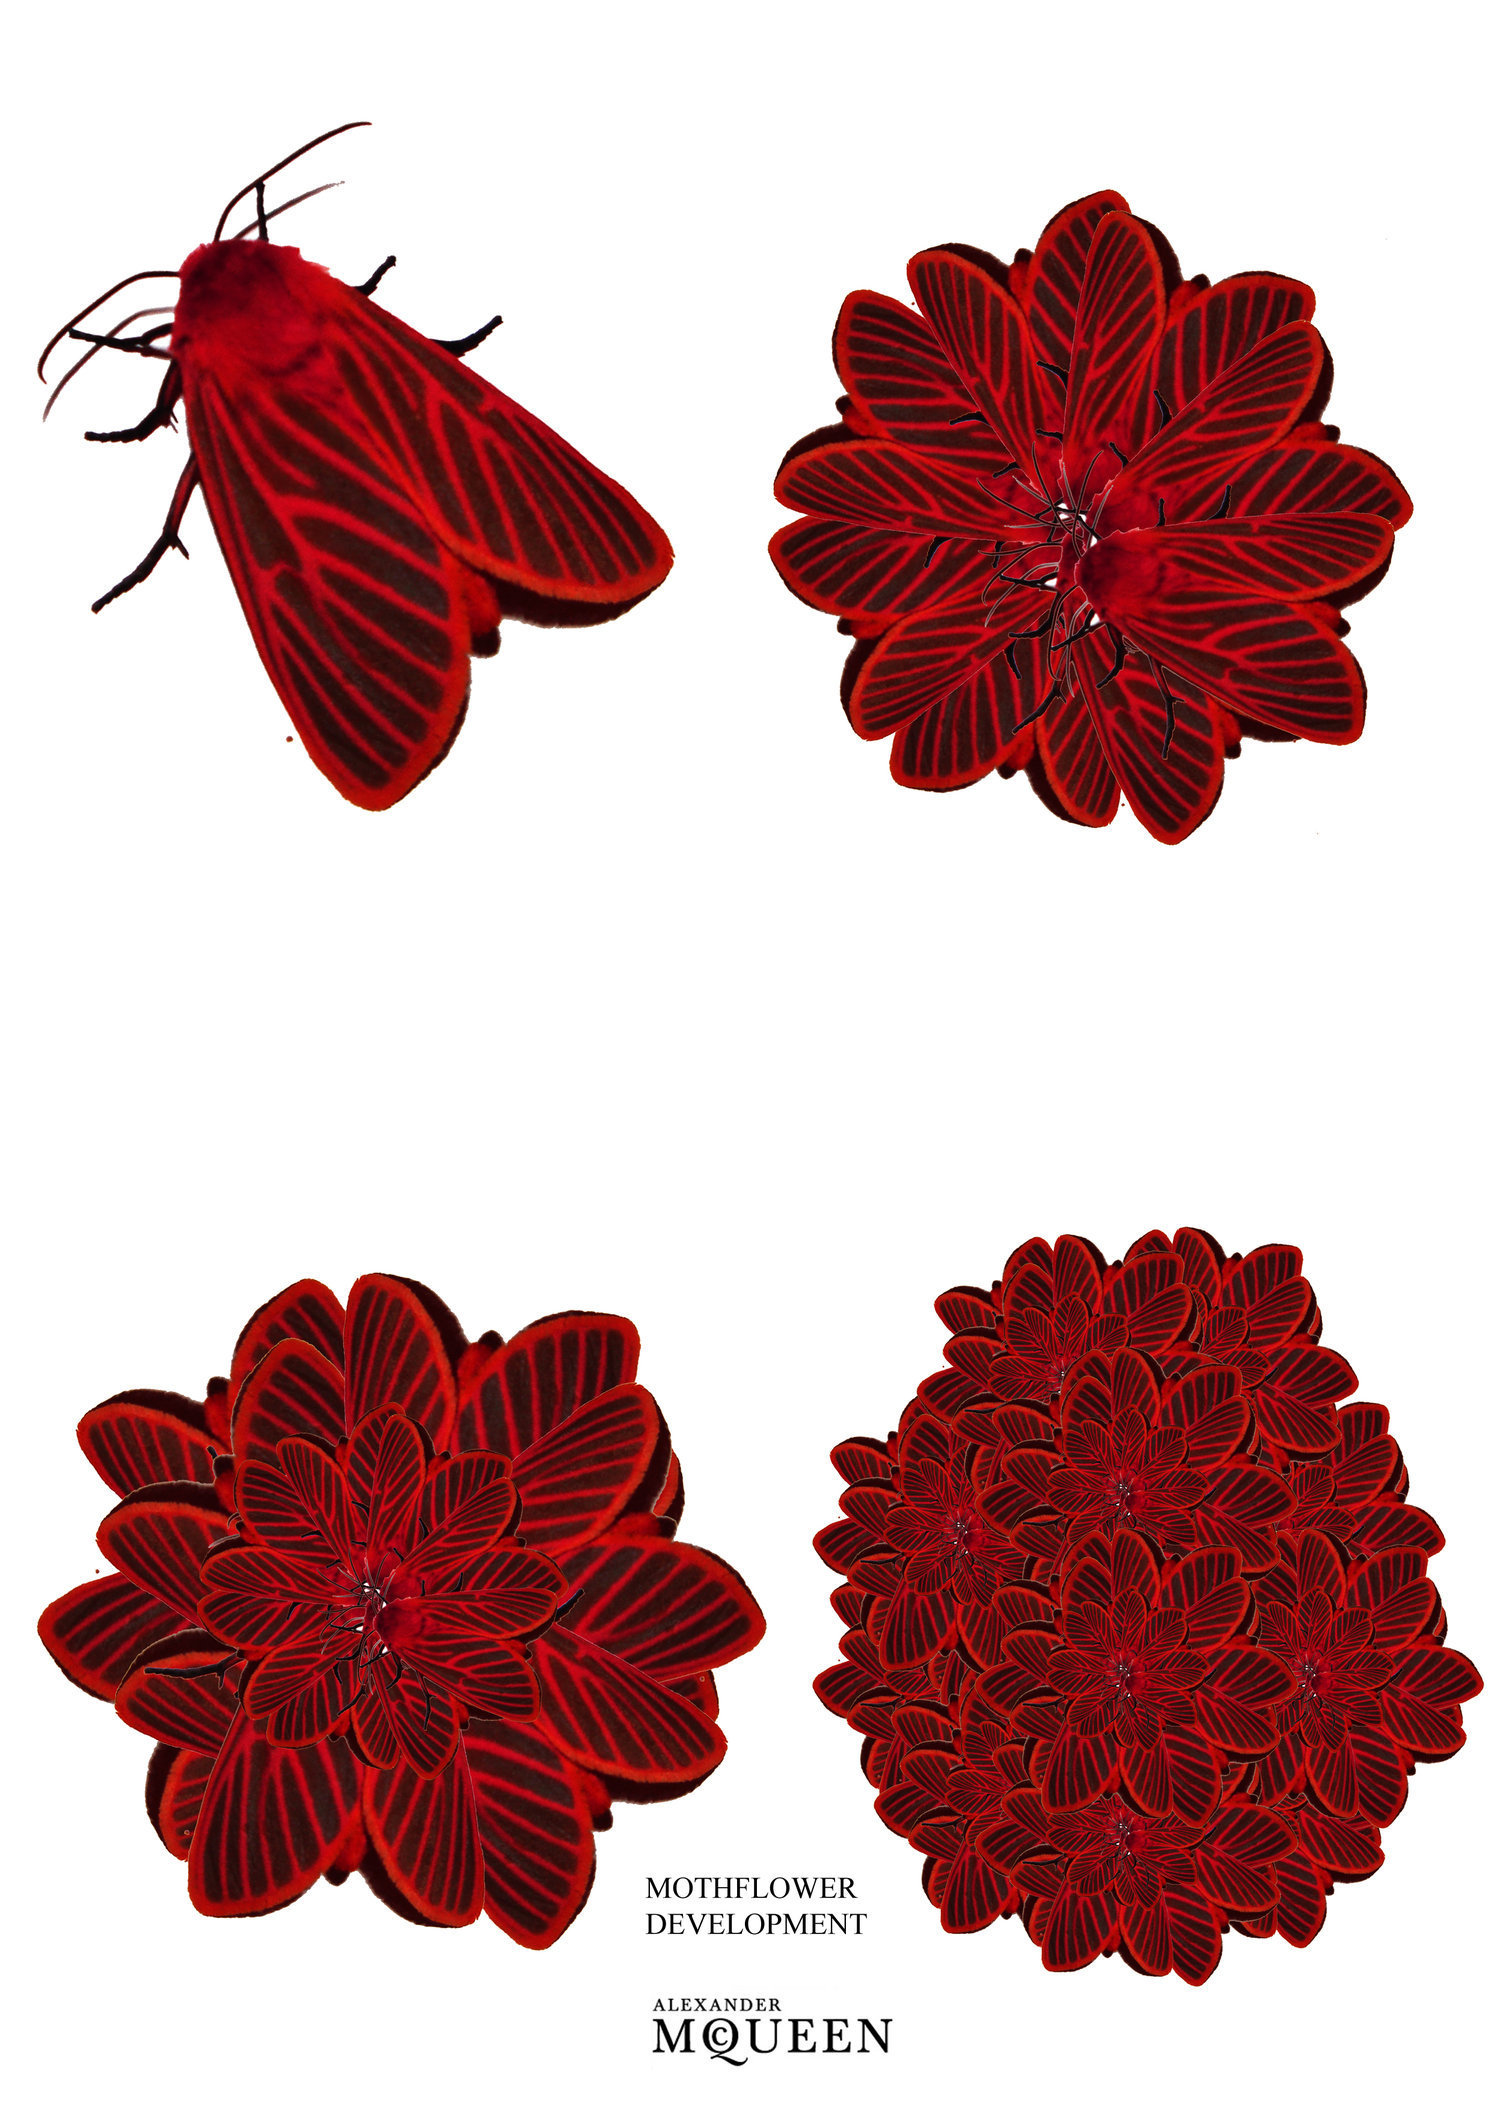 mothflower development.jpg